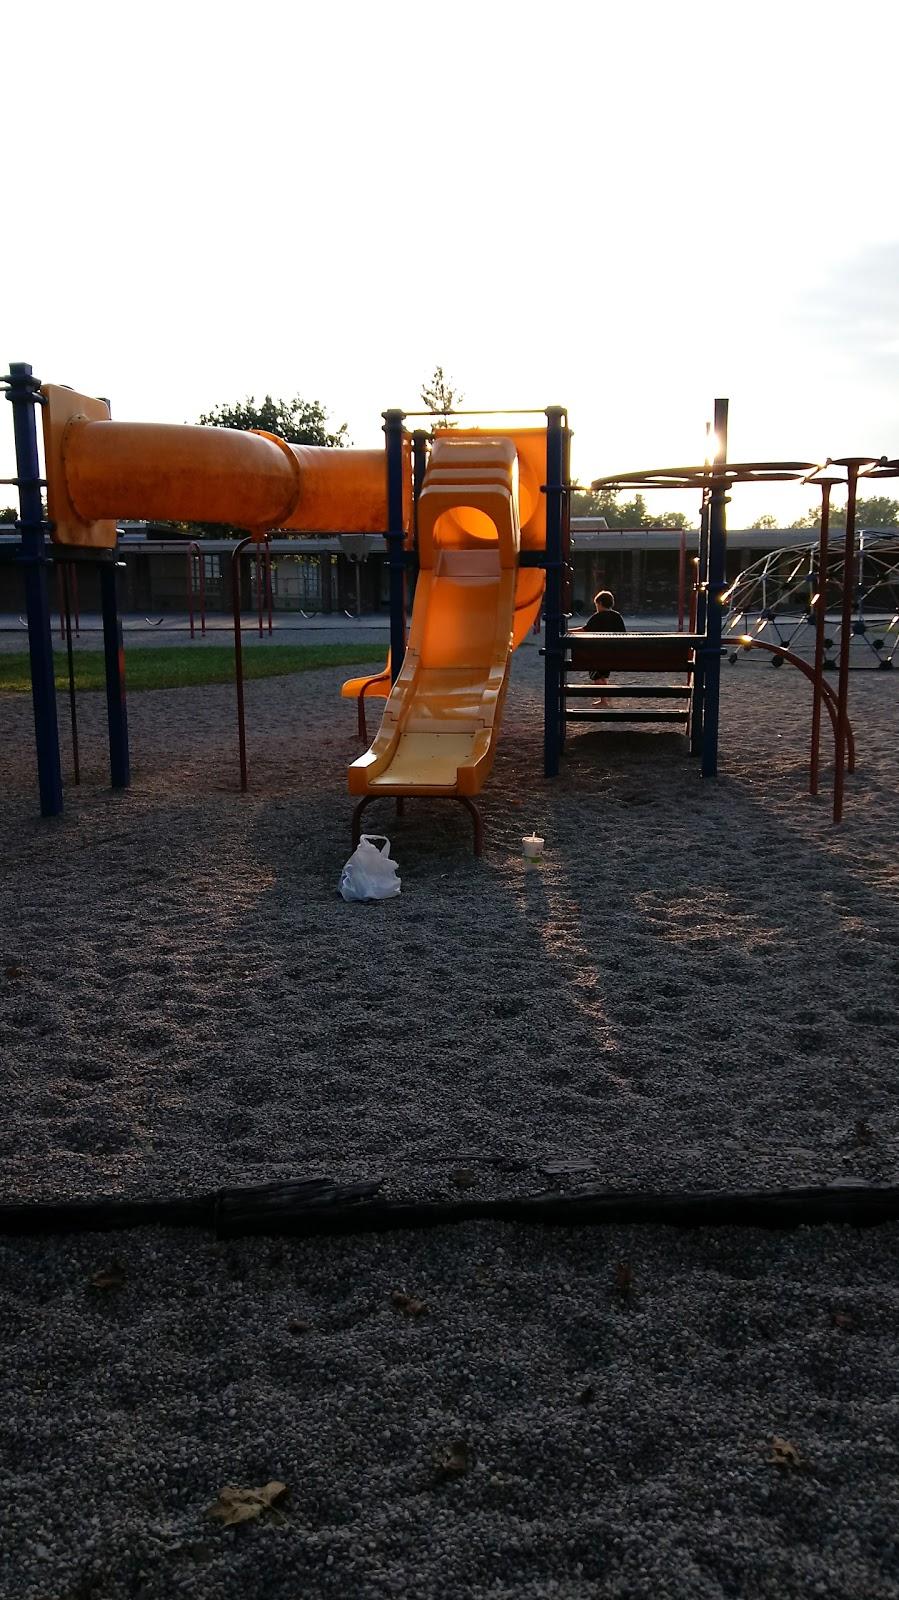 Summerside Elementary School - school    Photo 9 of 10   Address: 4639 Vermona Dr, Cincinnati, OH 45245, USA   Phone: (513) 947-7900